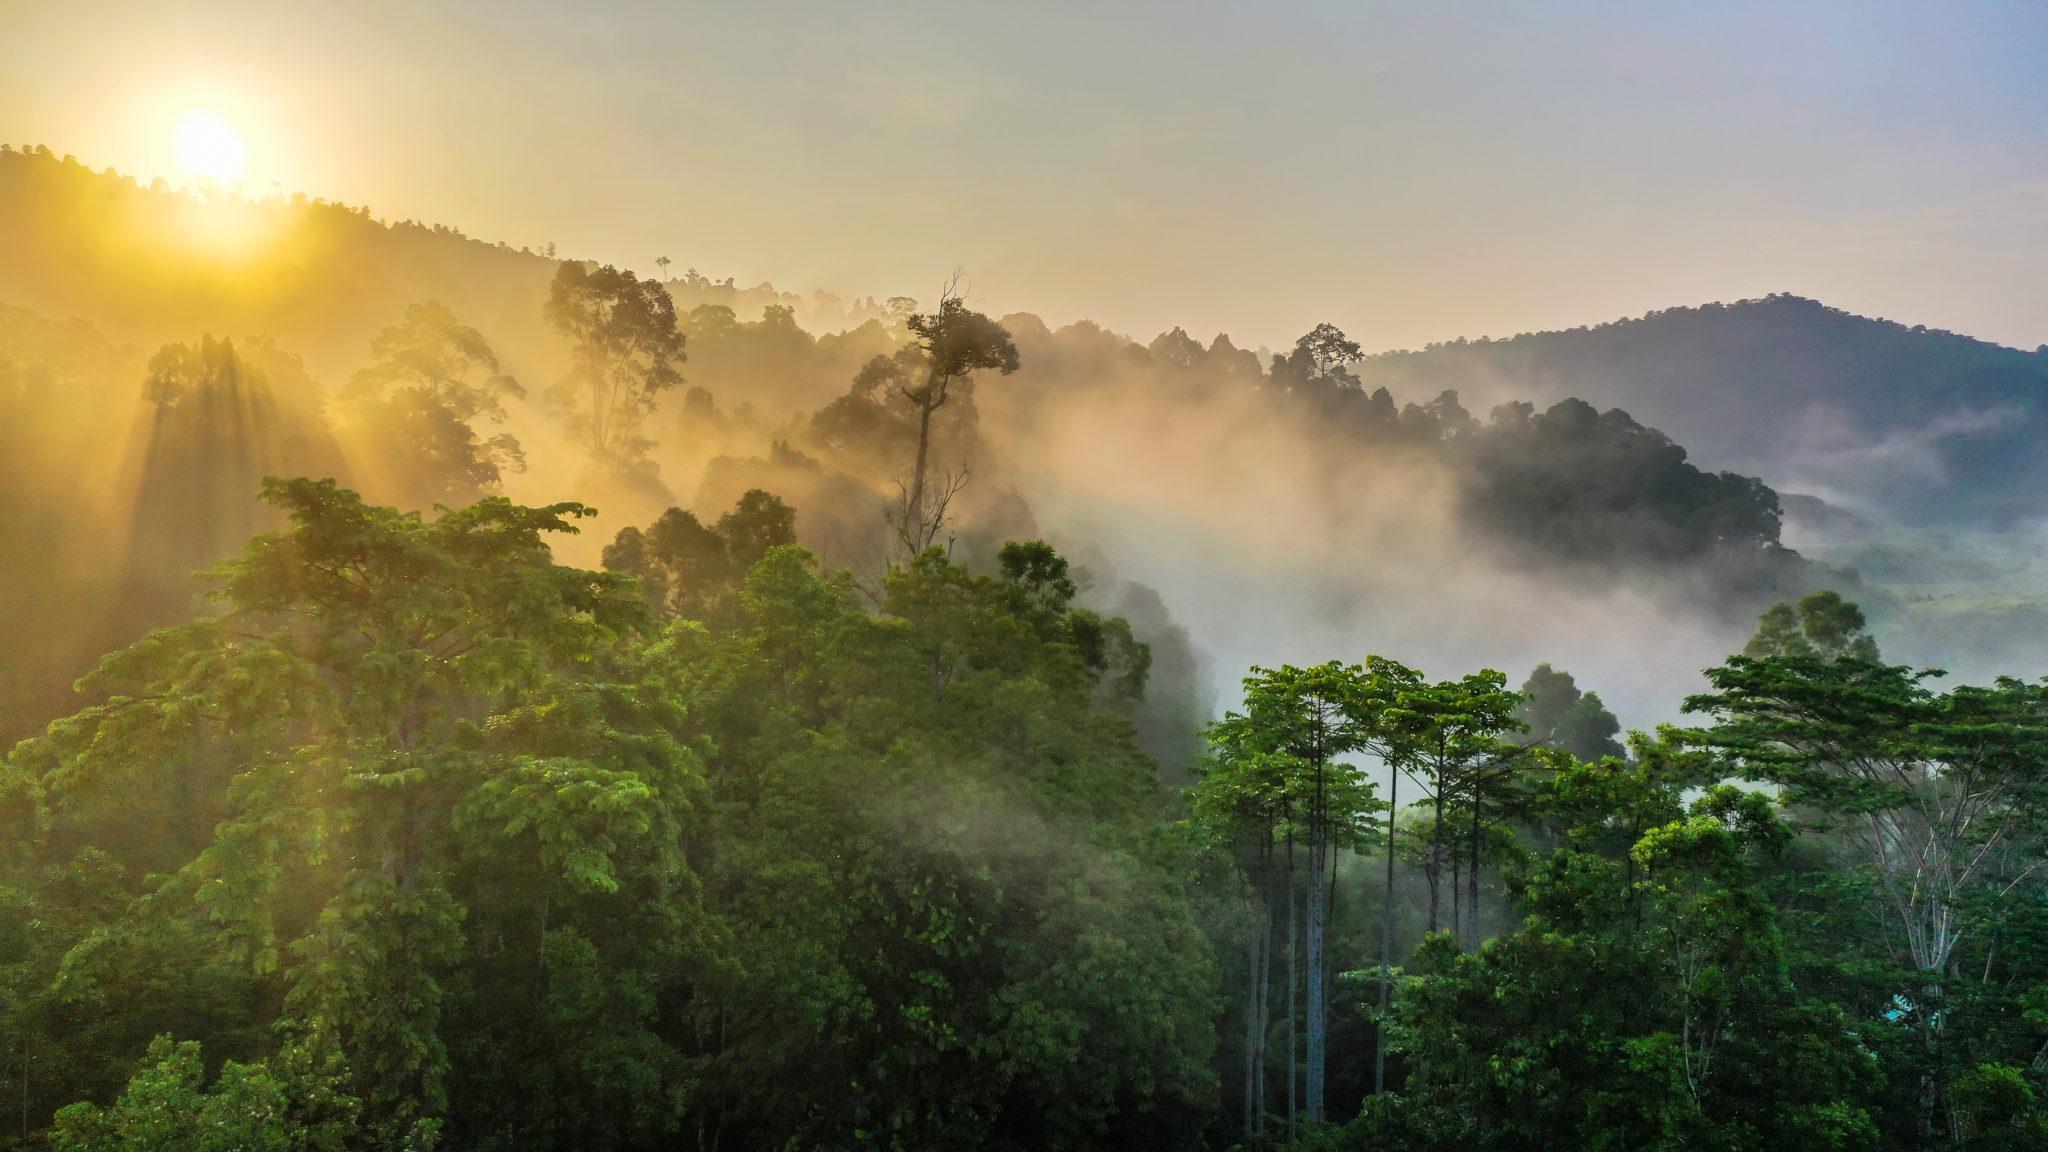 Tropical,Rainforest,,Stunning,View,Of,Borneo,Rainforest,With,Sunrise,Mist